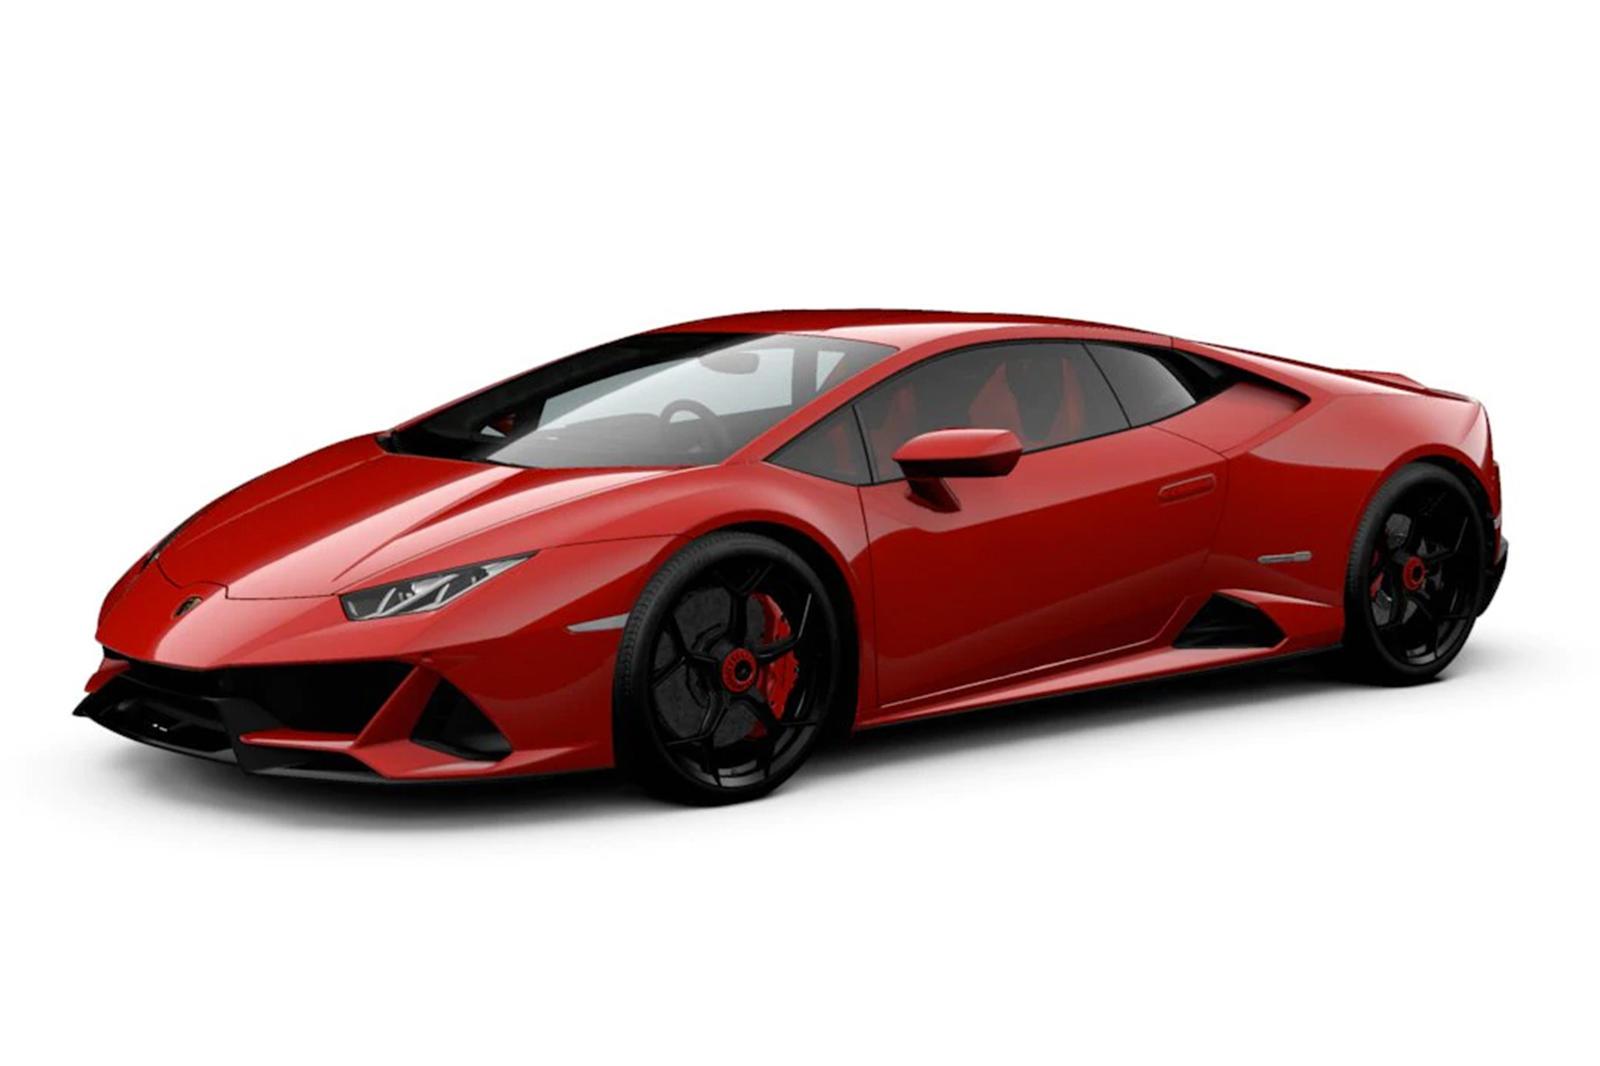 Waste Hours Configuring Your Dream Lamborghini Huracan Evo Carbuzz